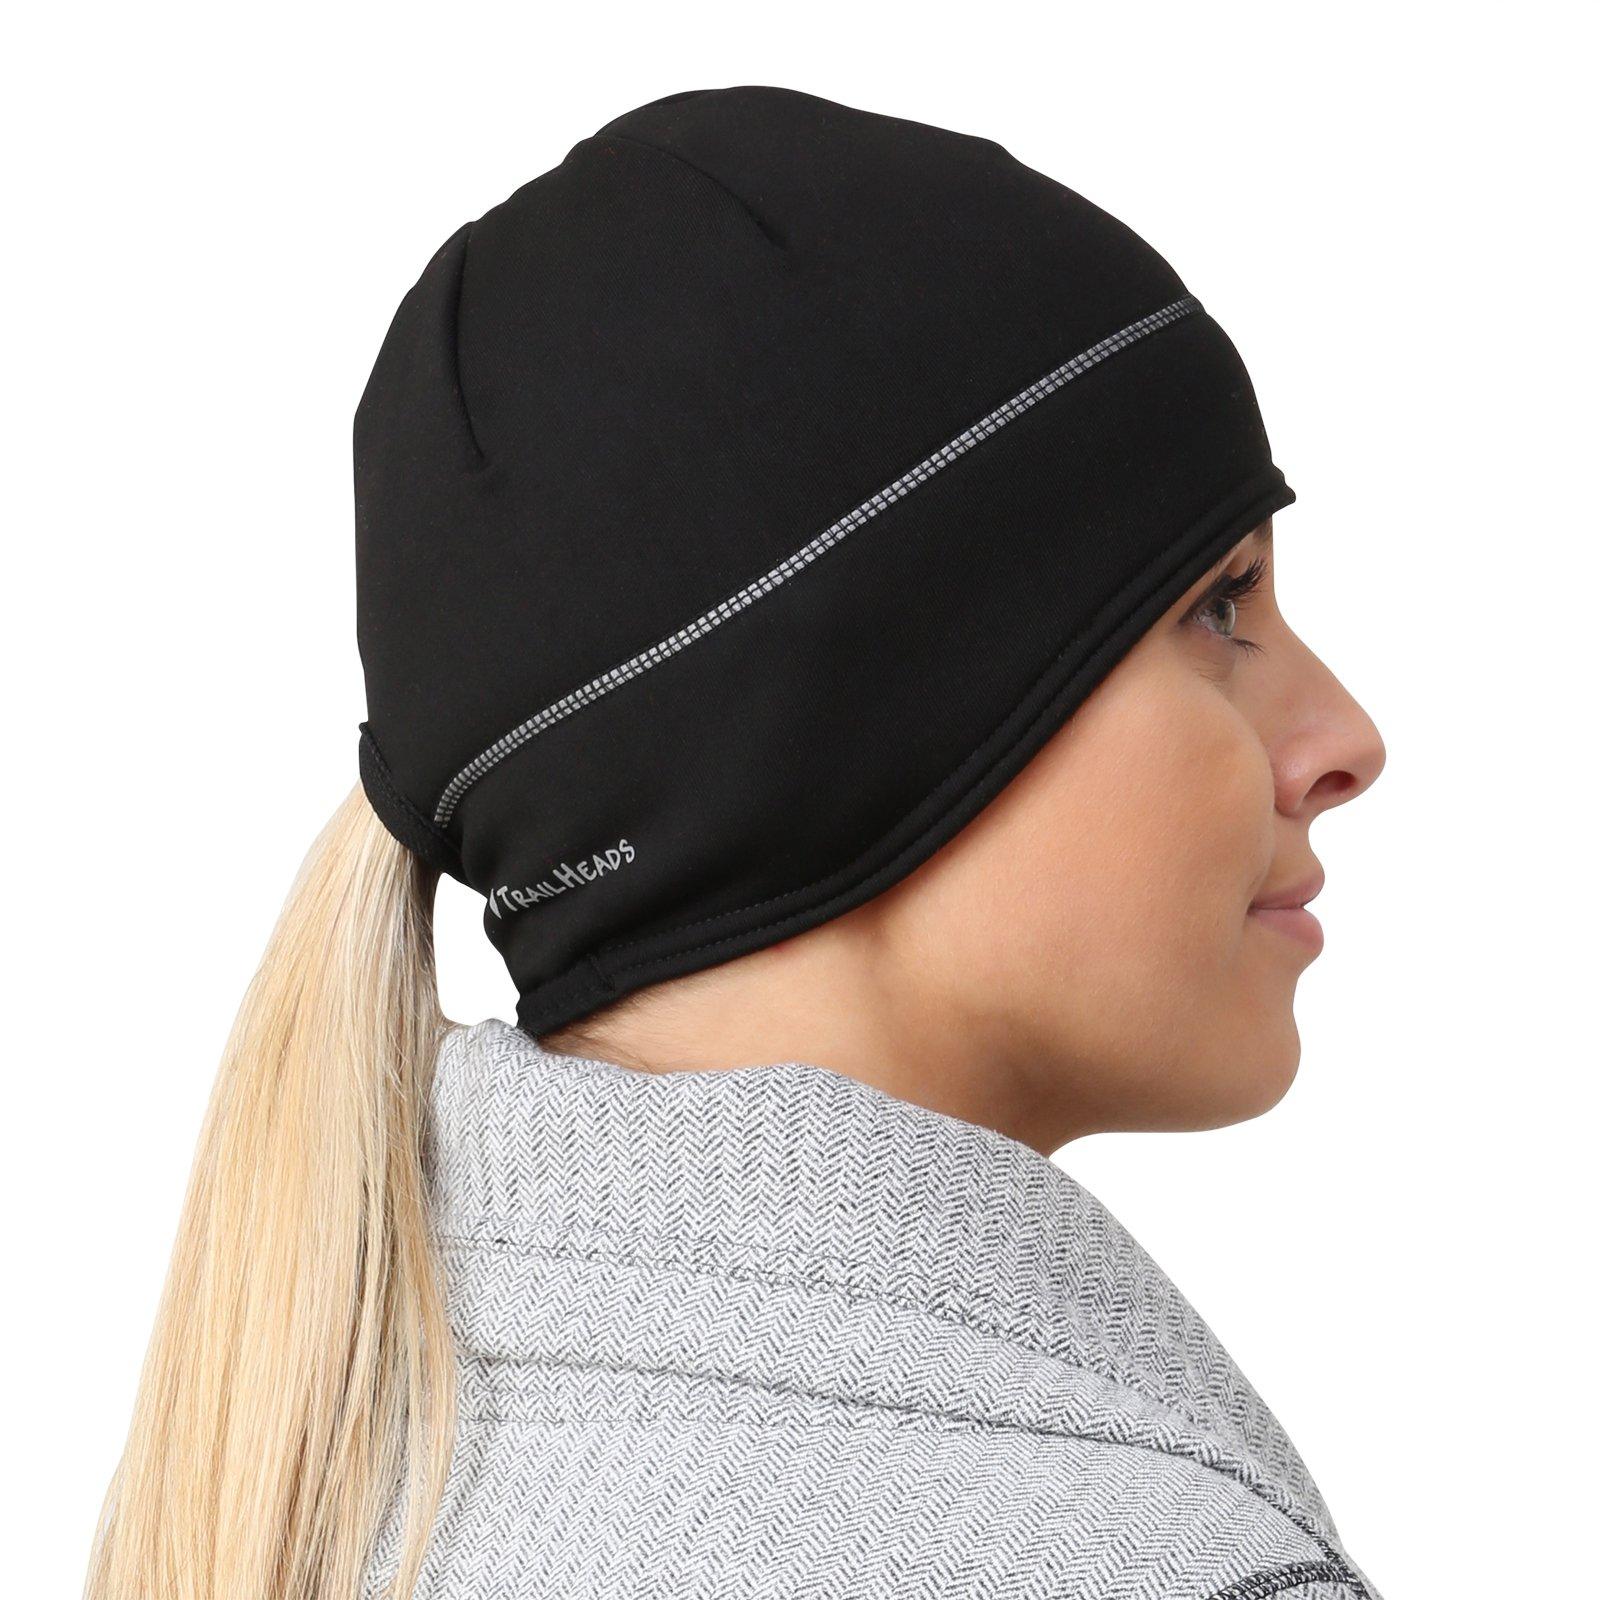 992c191c TrailHeads Women' s Winter Ponytail Beanie Reflective Power Beanie  Performance Running Hat